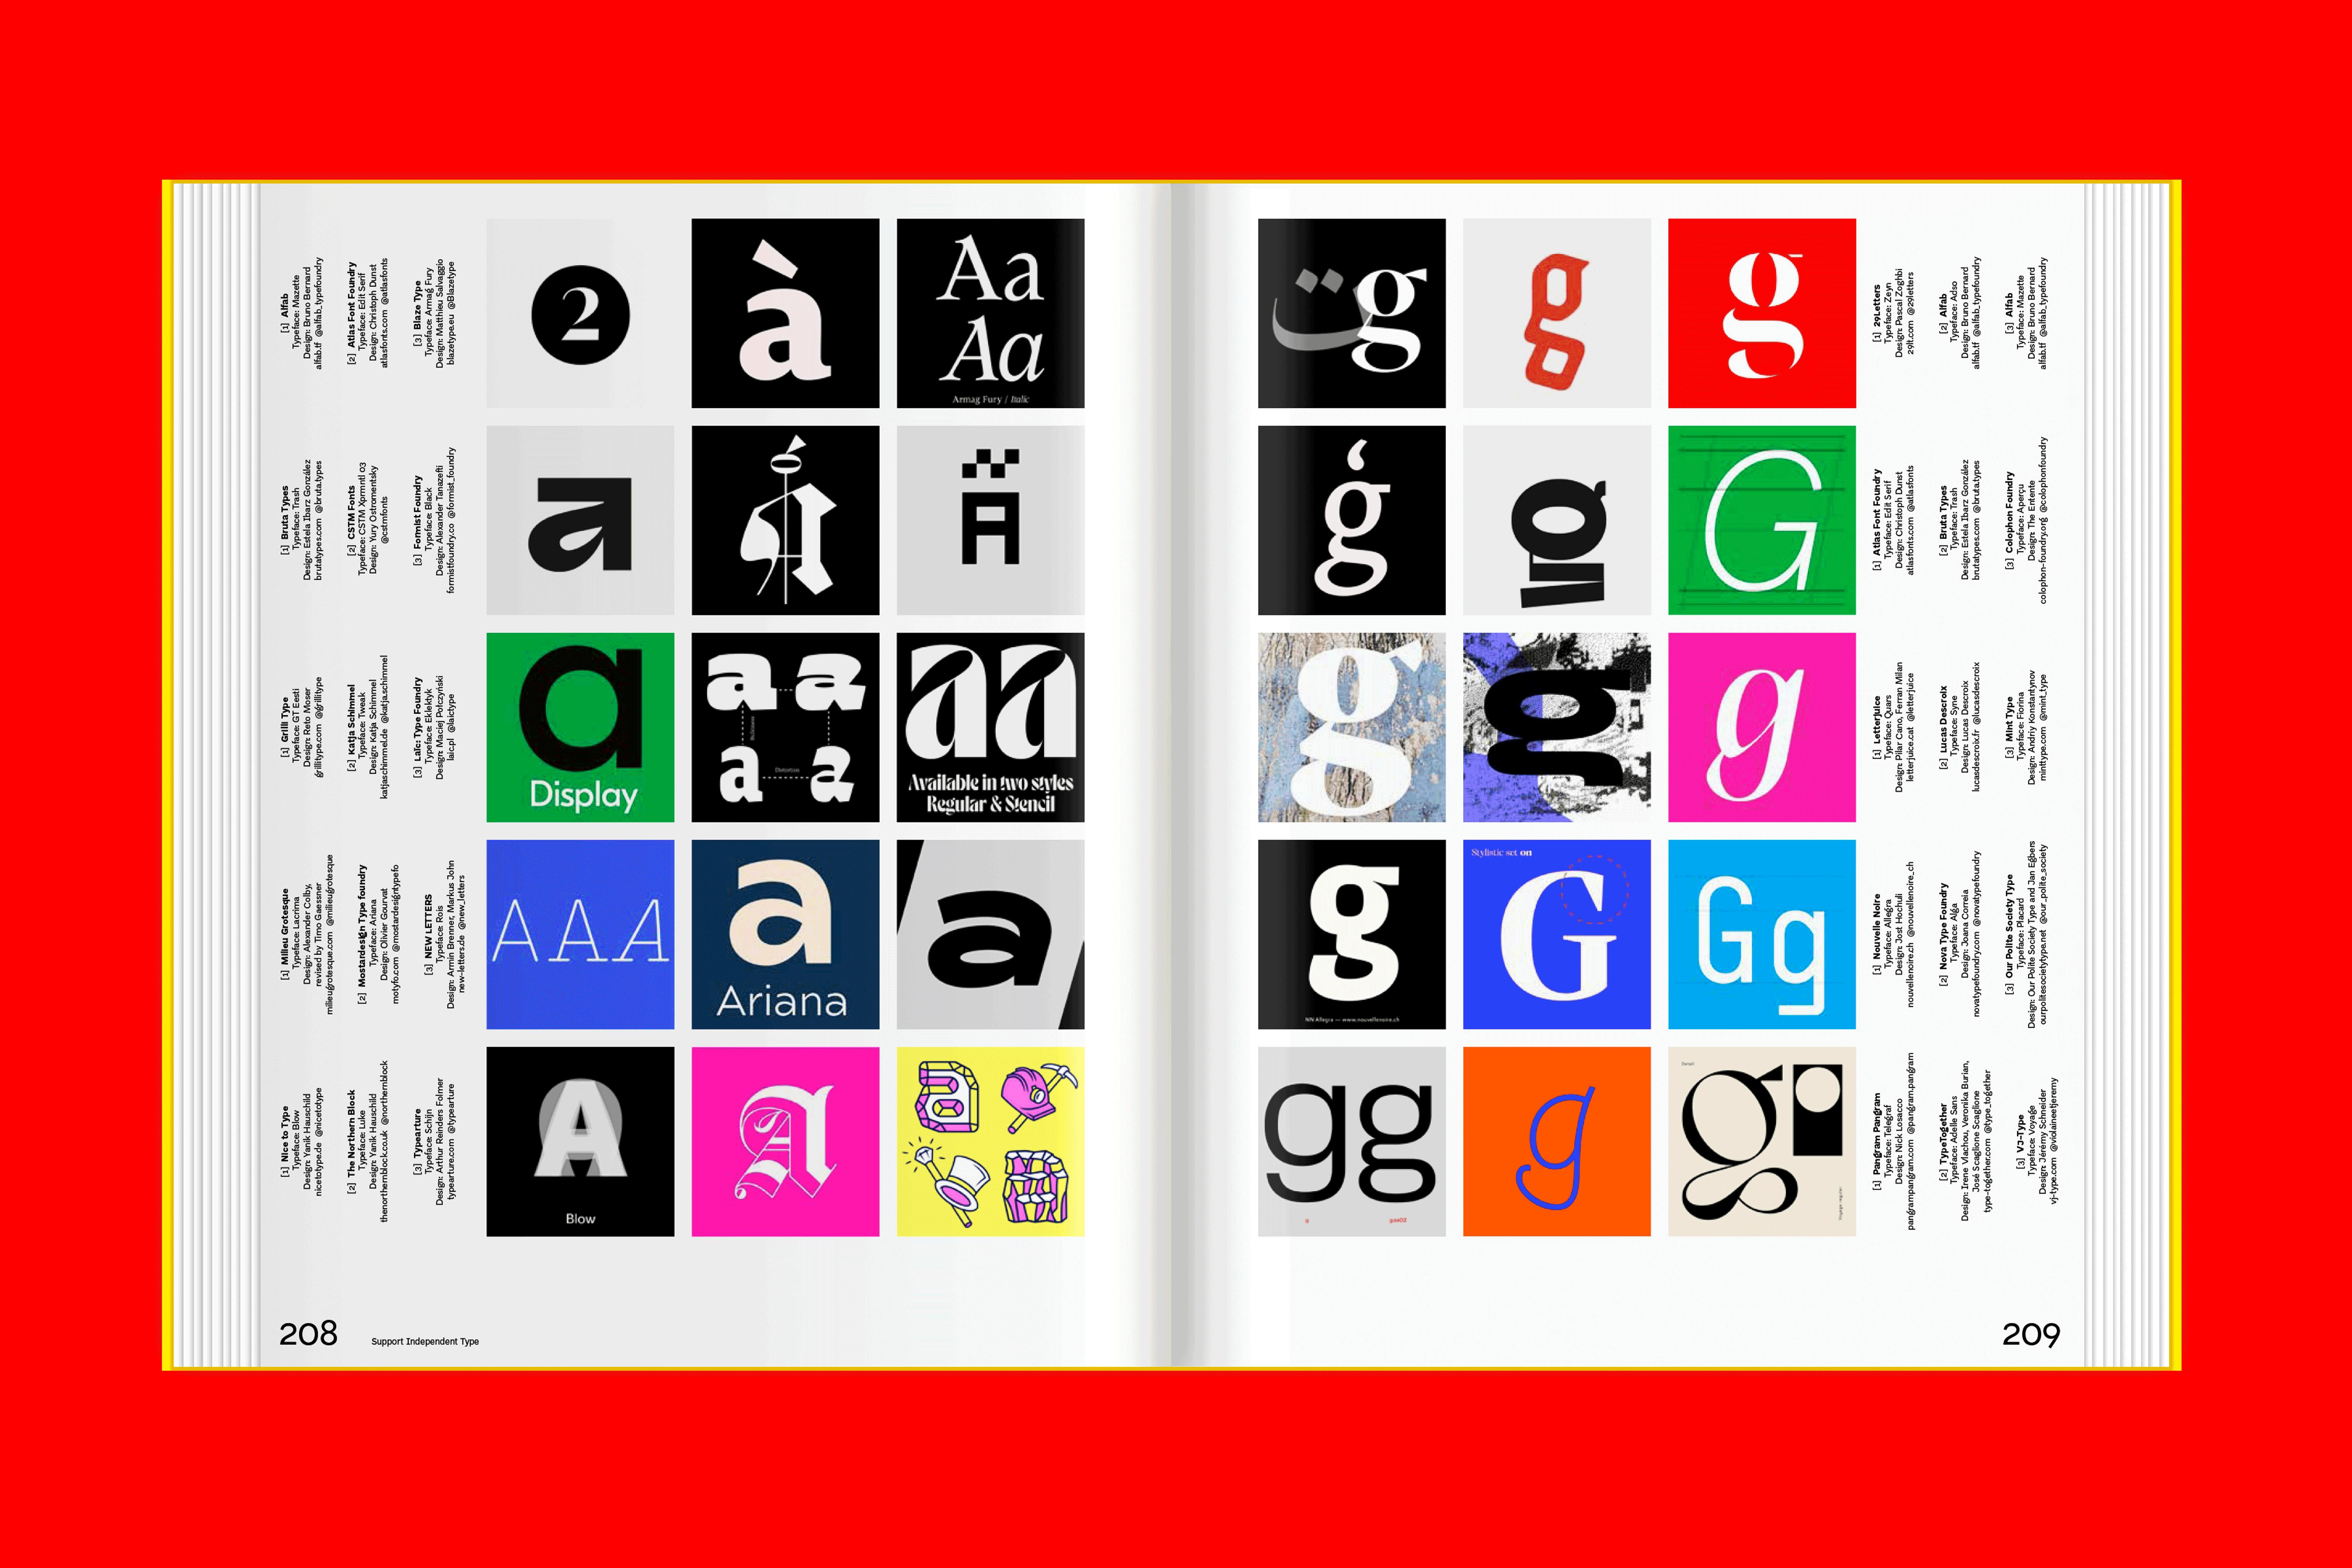 Slanted-Publiaktionen-Slanted-Publishers-Support-Independent-Type_27